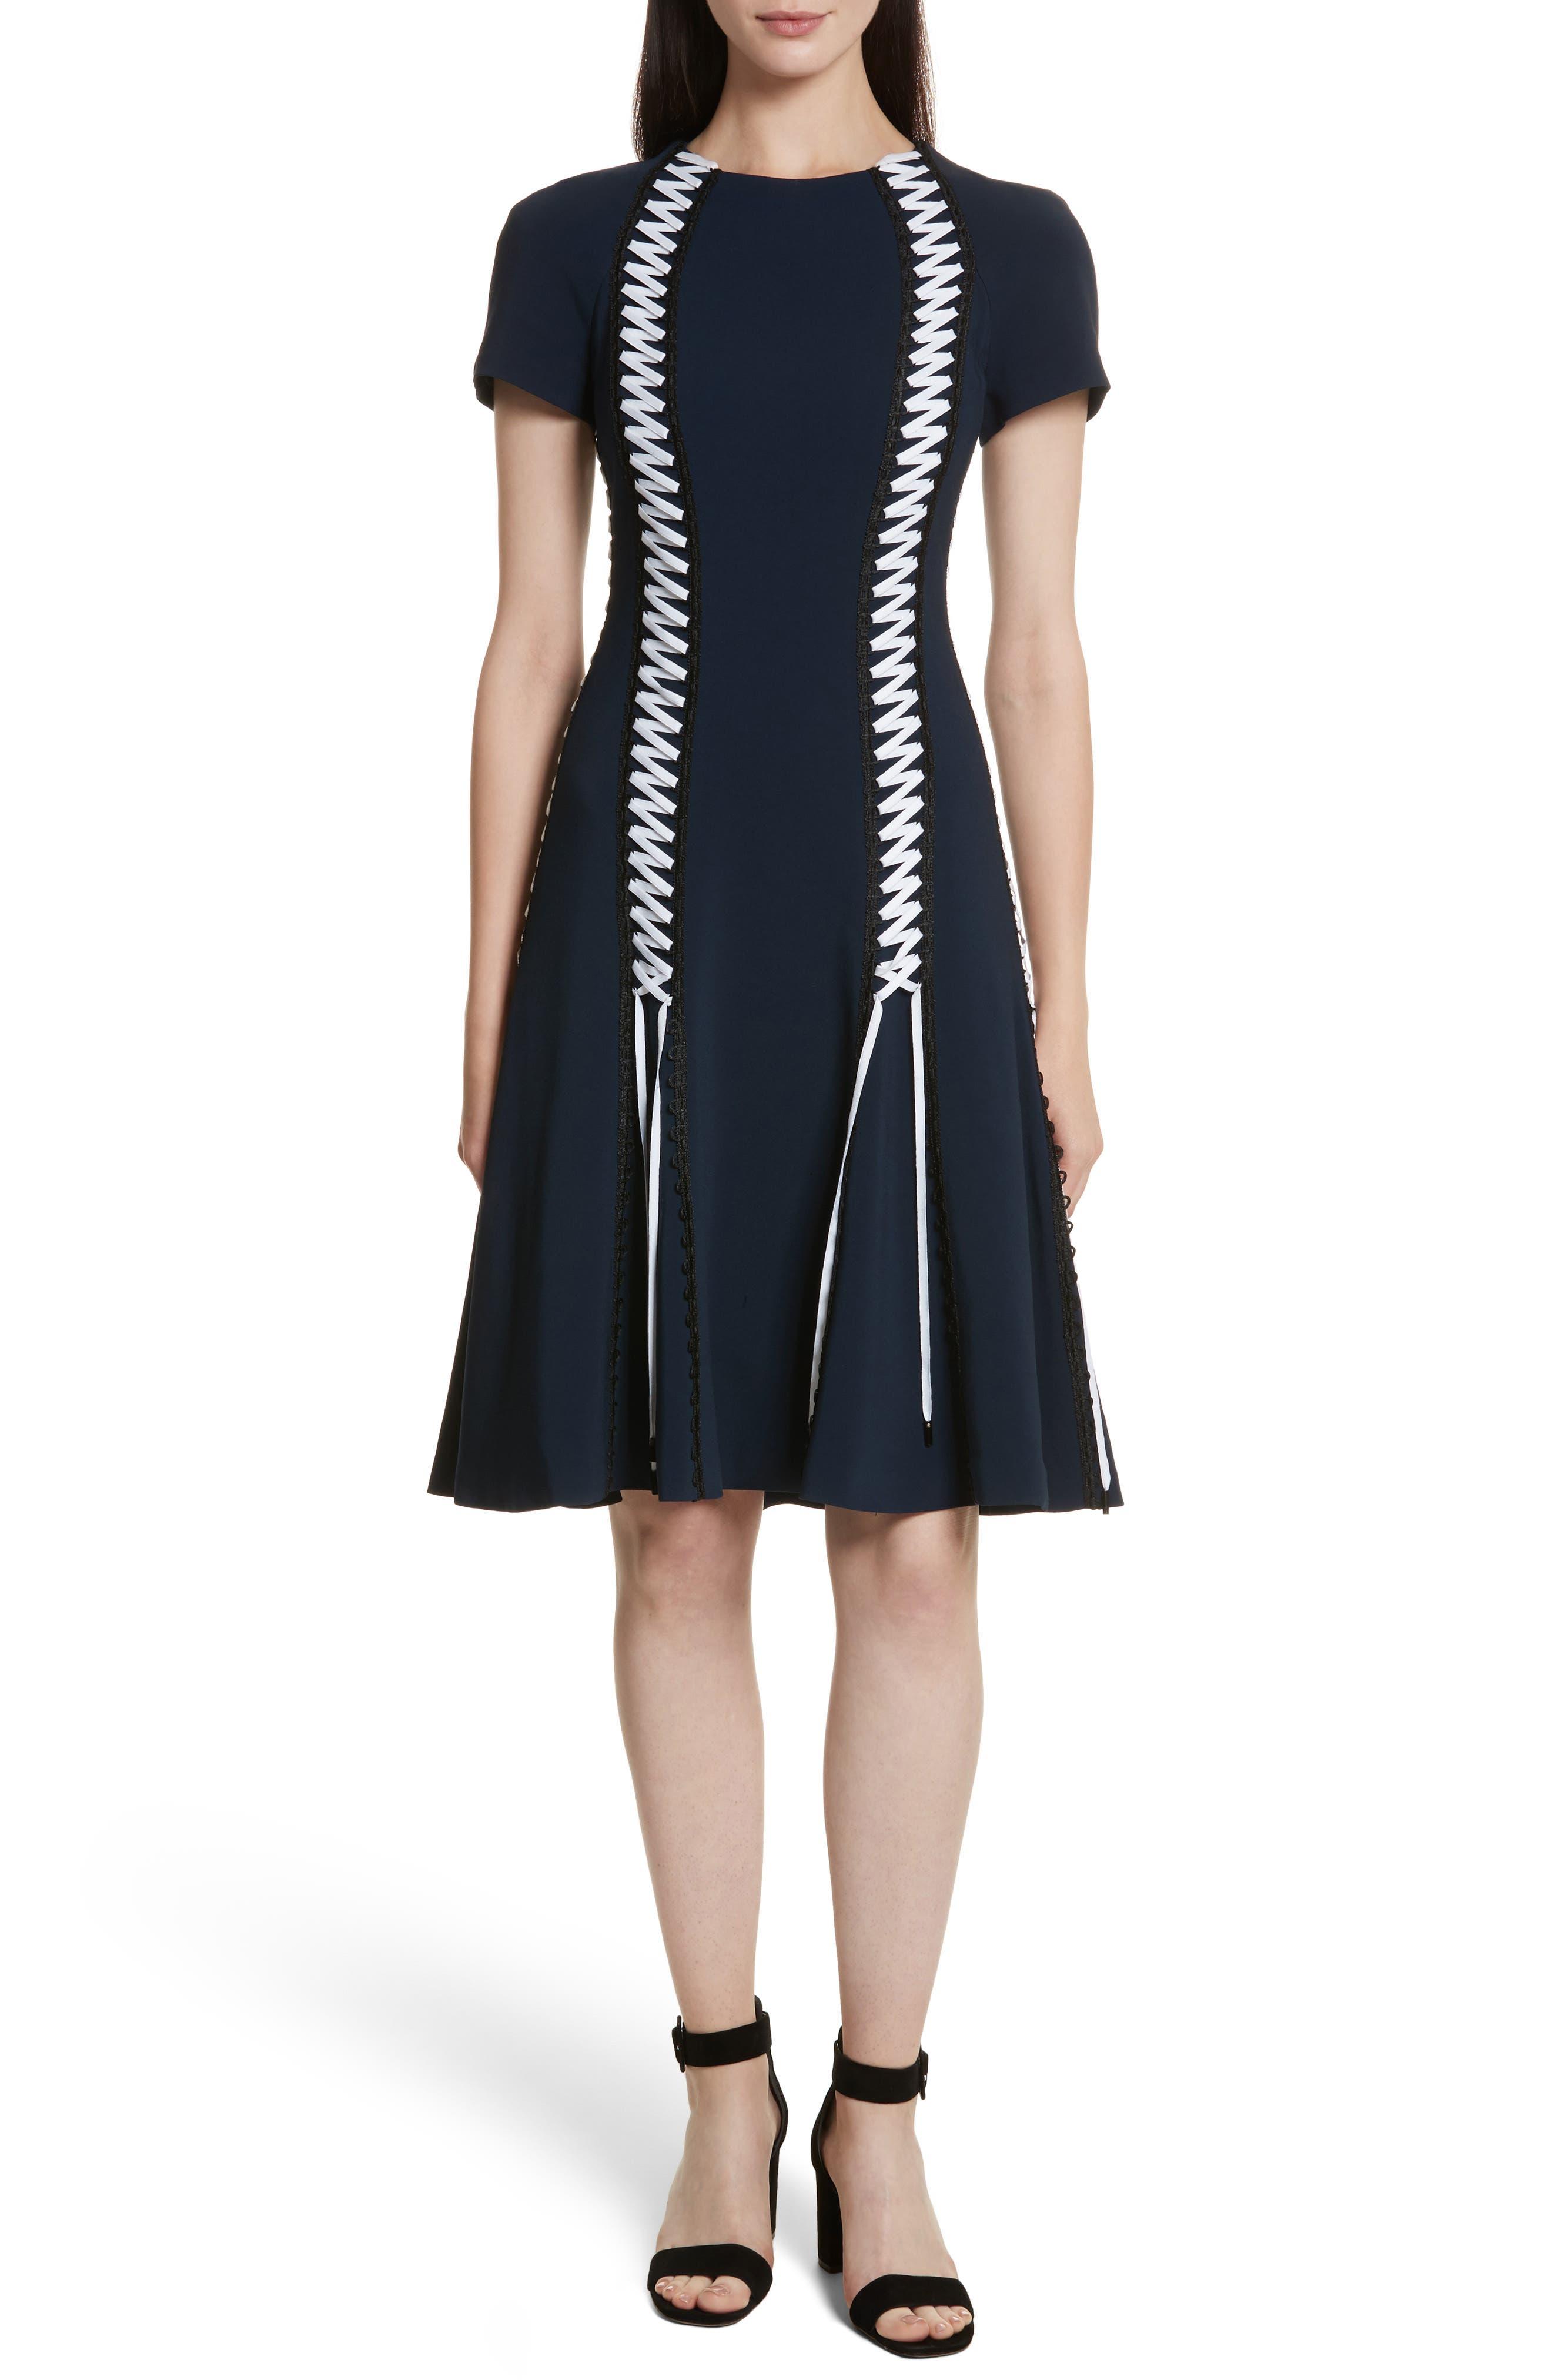 Alternate Image 1 Selected - Jonathan Simkhai Lace-Up Crepe Dress